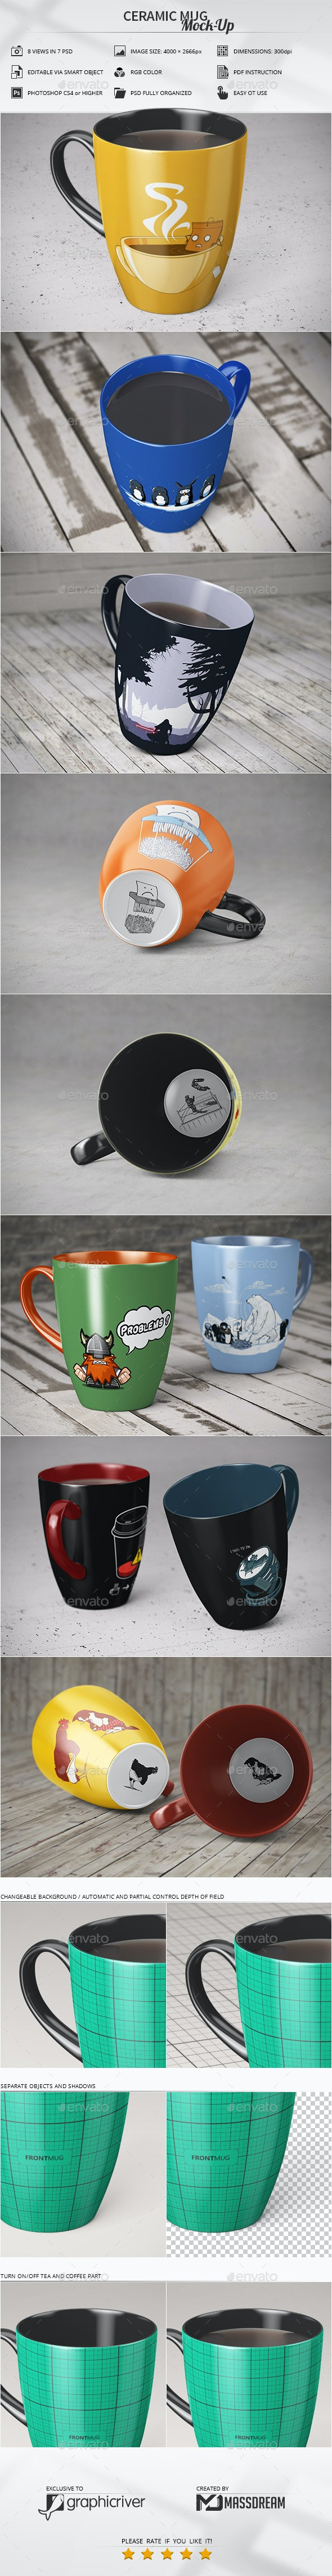 Ceramic Mug Mock-Up - Print Product Mock-Ups